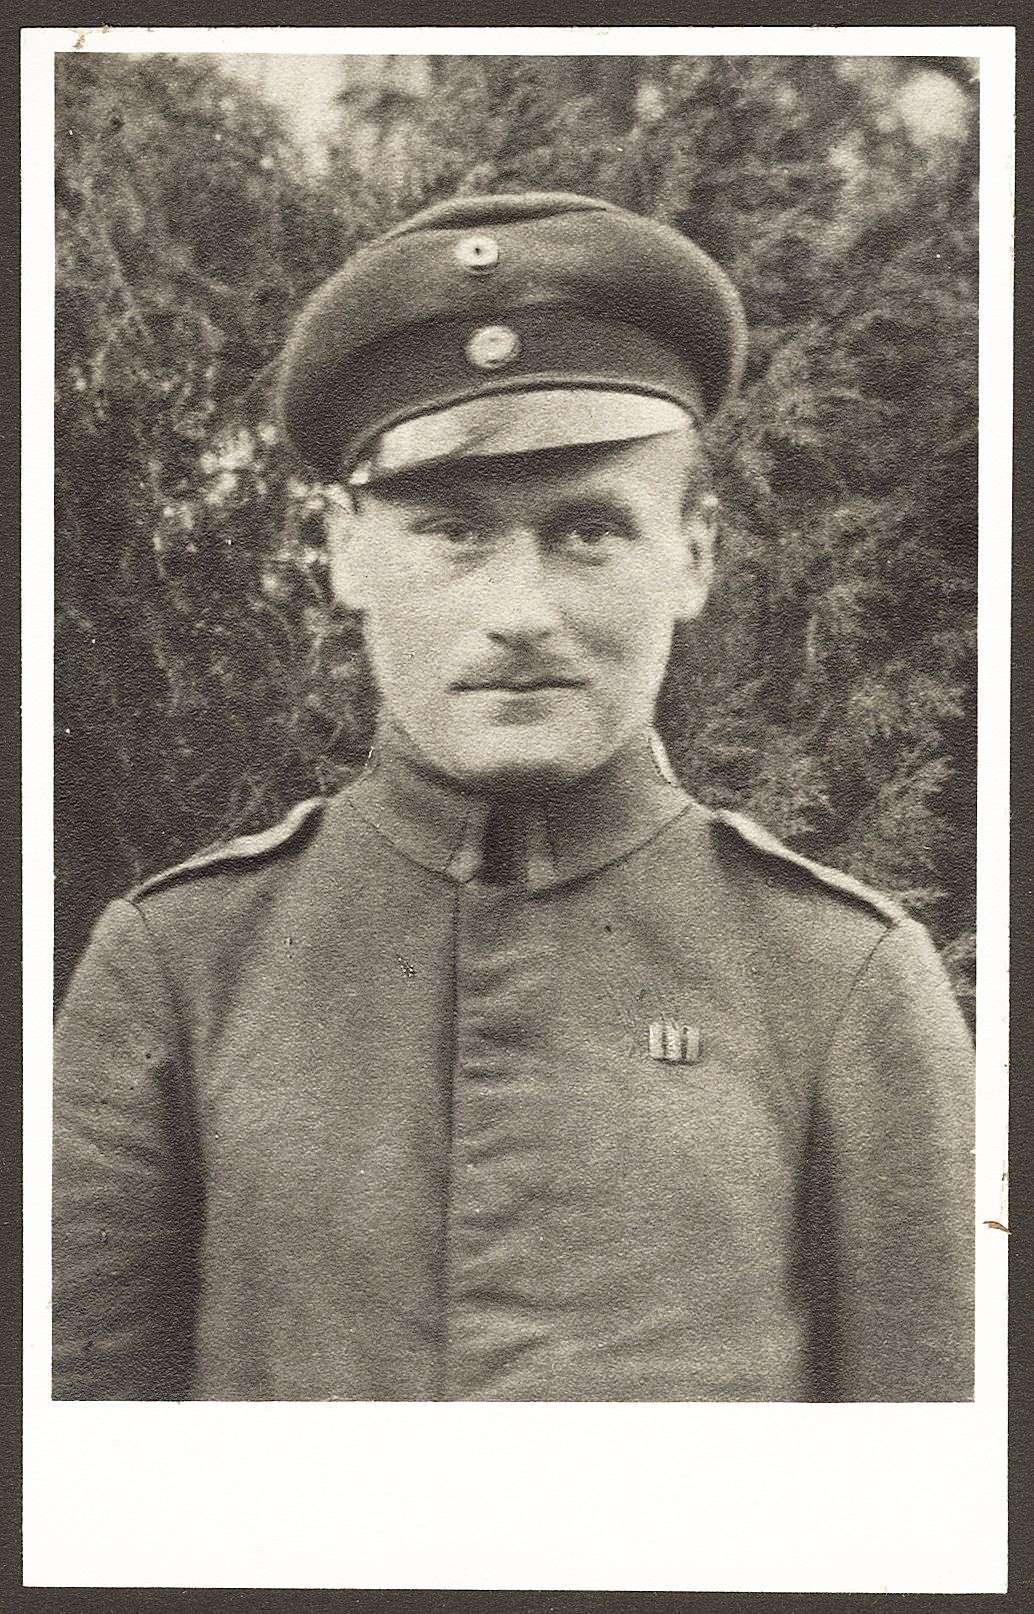 Herold, Hermann, Bild 2